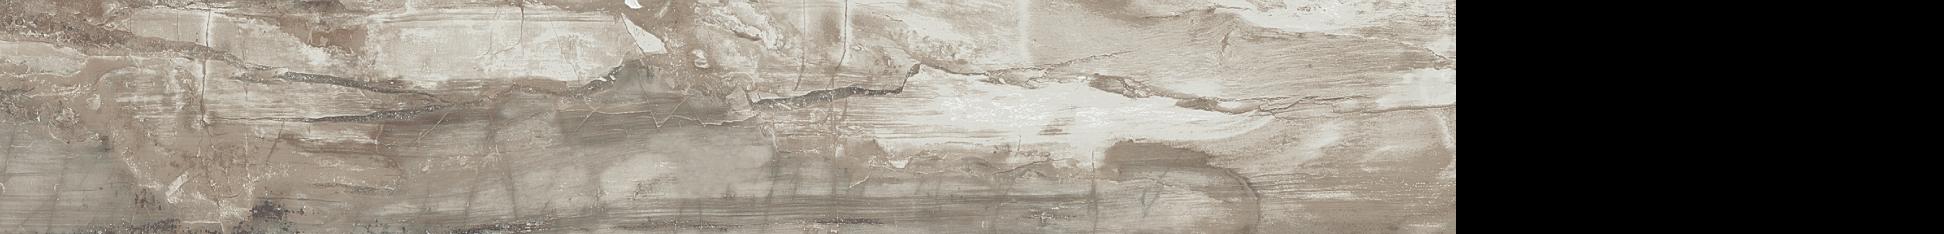 petrified wood 6.5x 39.25 musk natural and polished